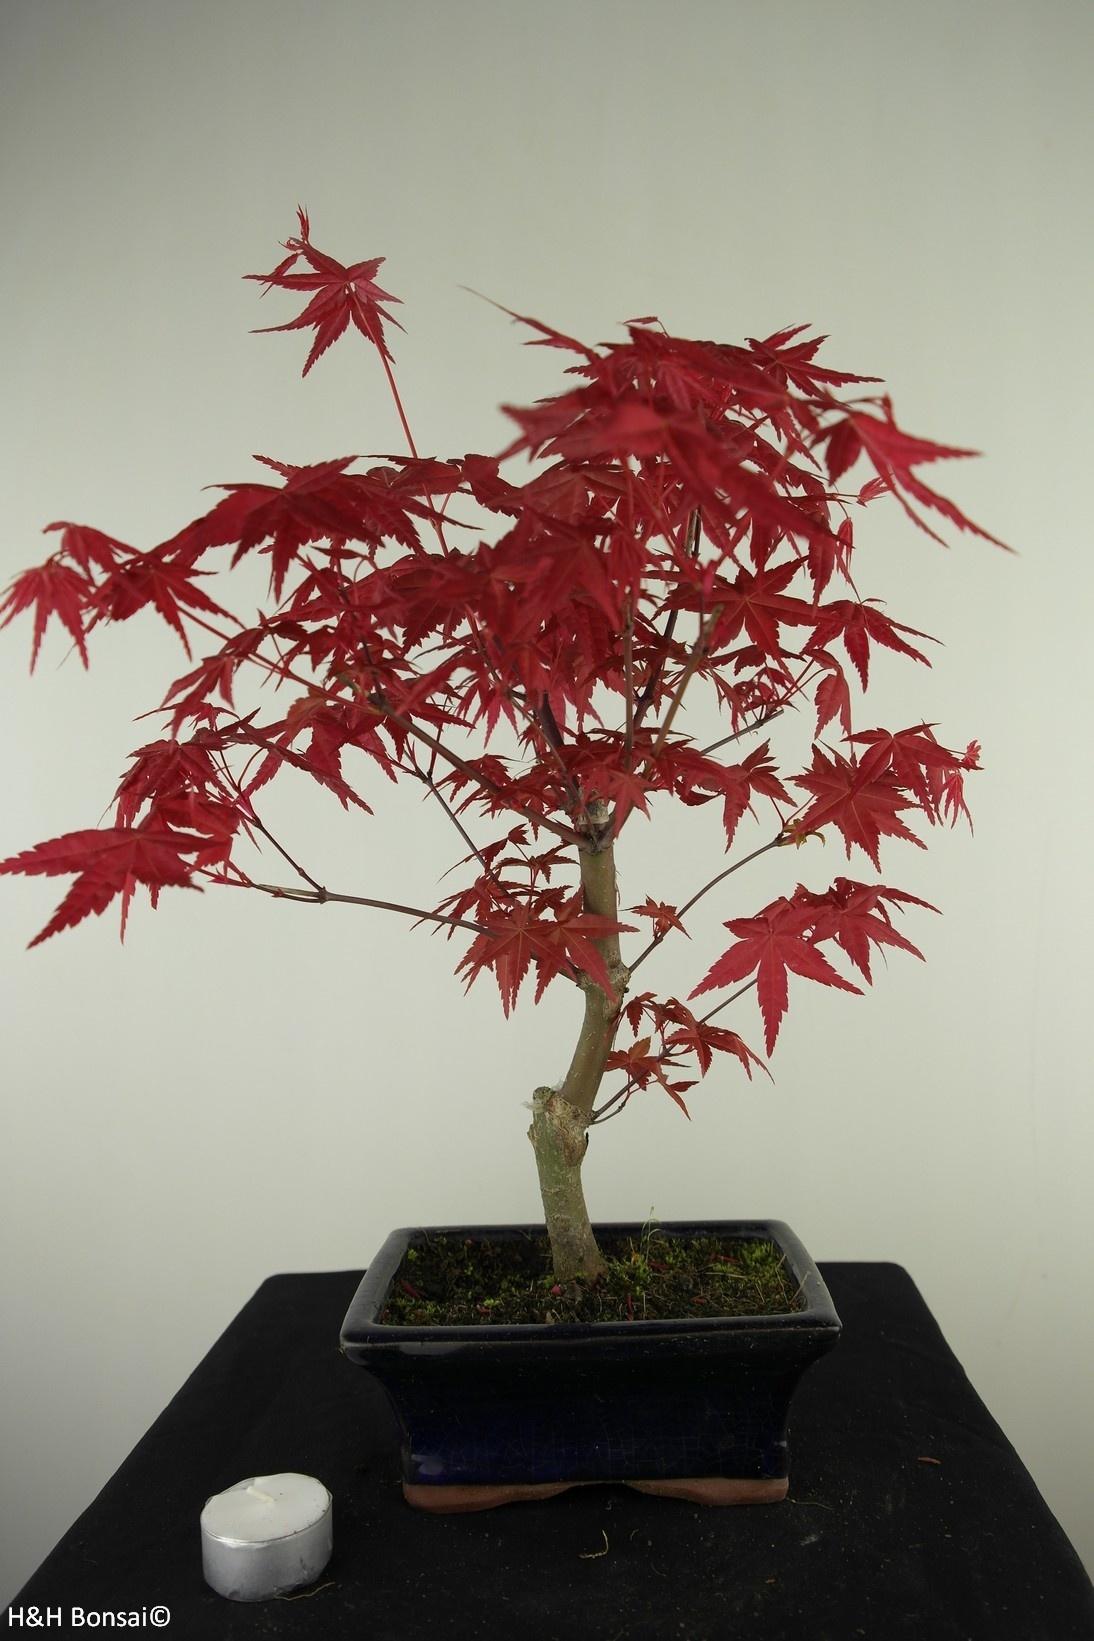 Bonsai Japanese Red Maple, Acer palmatum deshojo, no. 7718